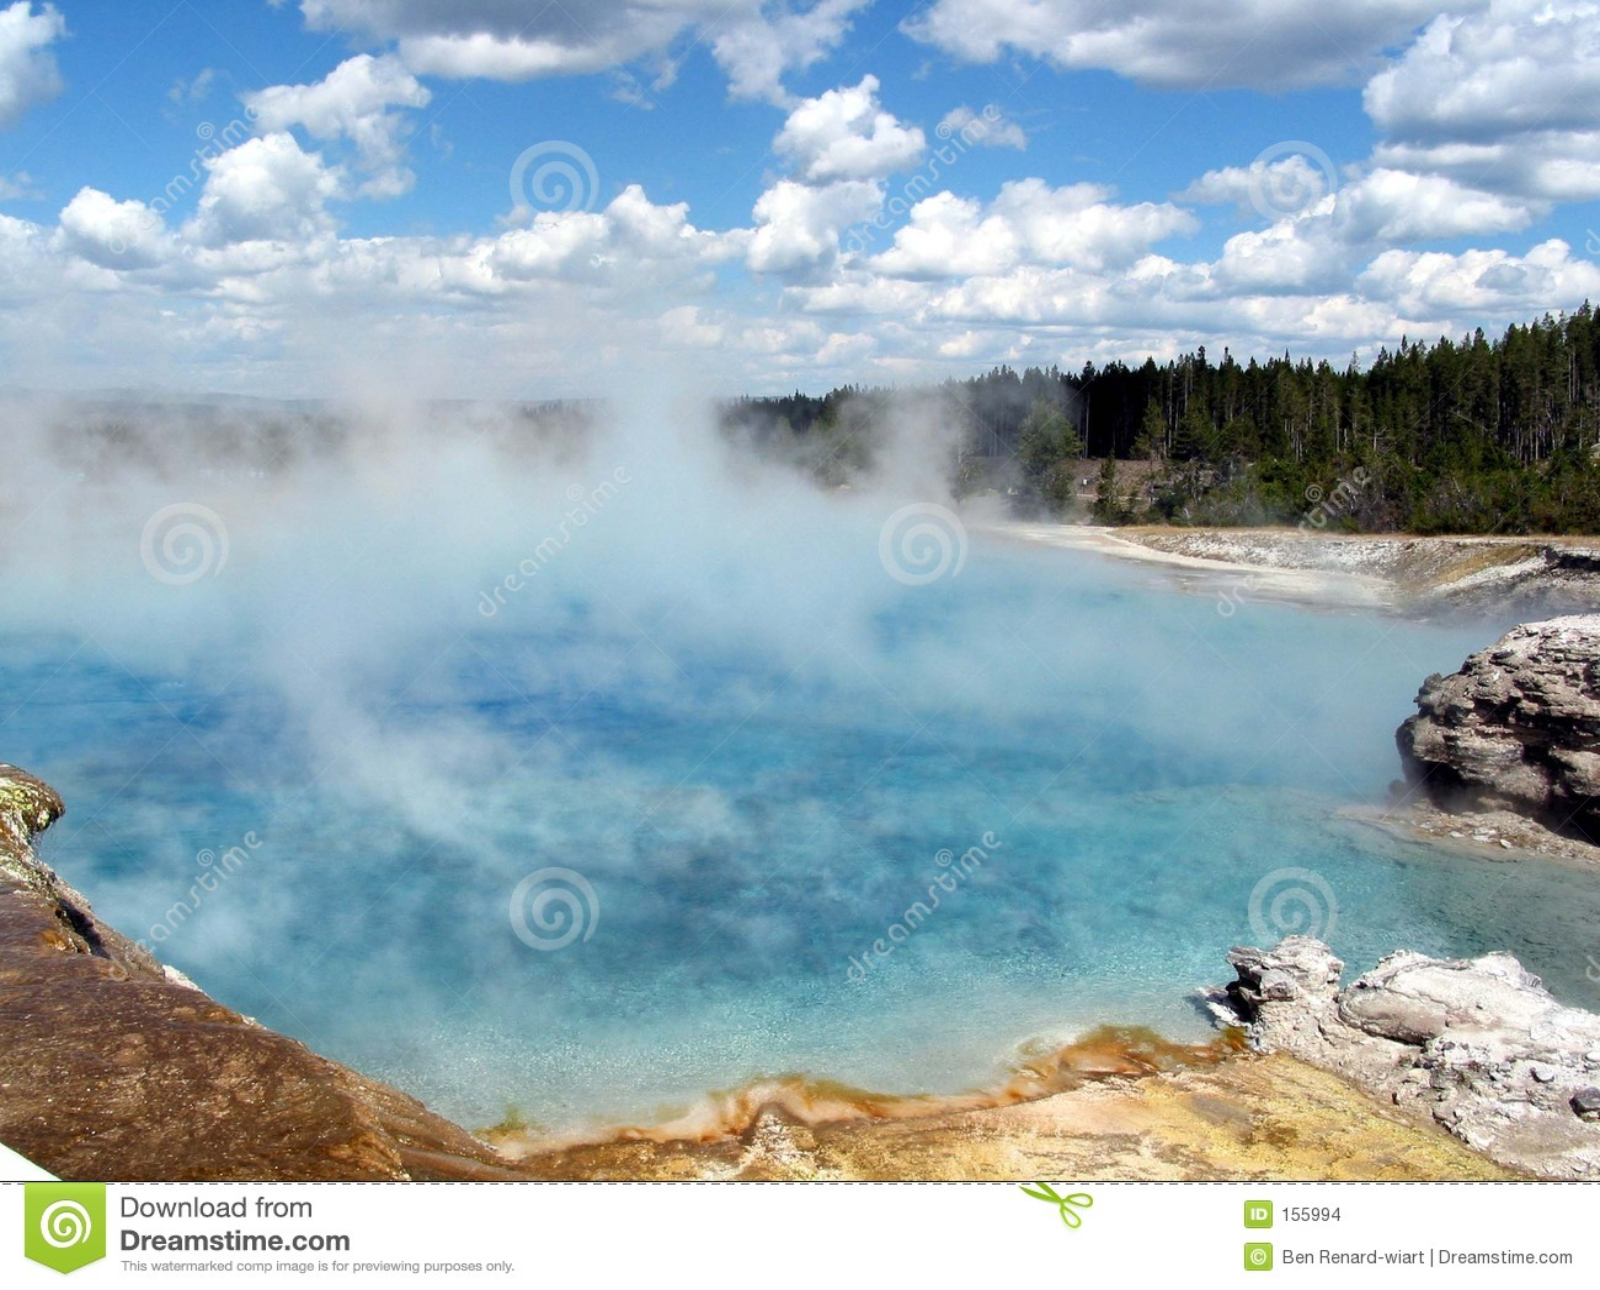 hot springs national park buddhist singles Hot springs national park, ar 71901 rolando's restaurante 223 garrison ave fort smith, ar rolando's.